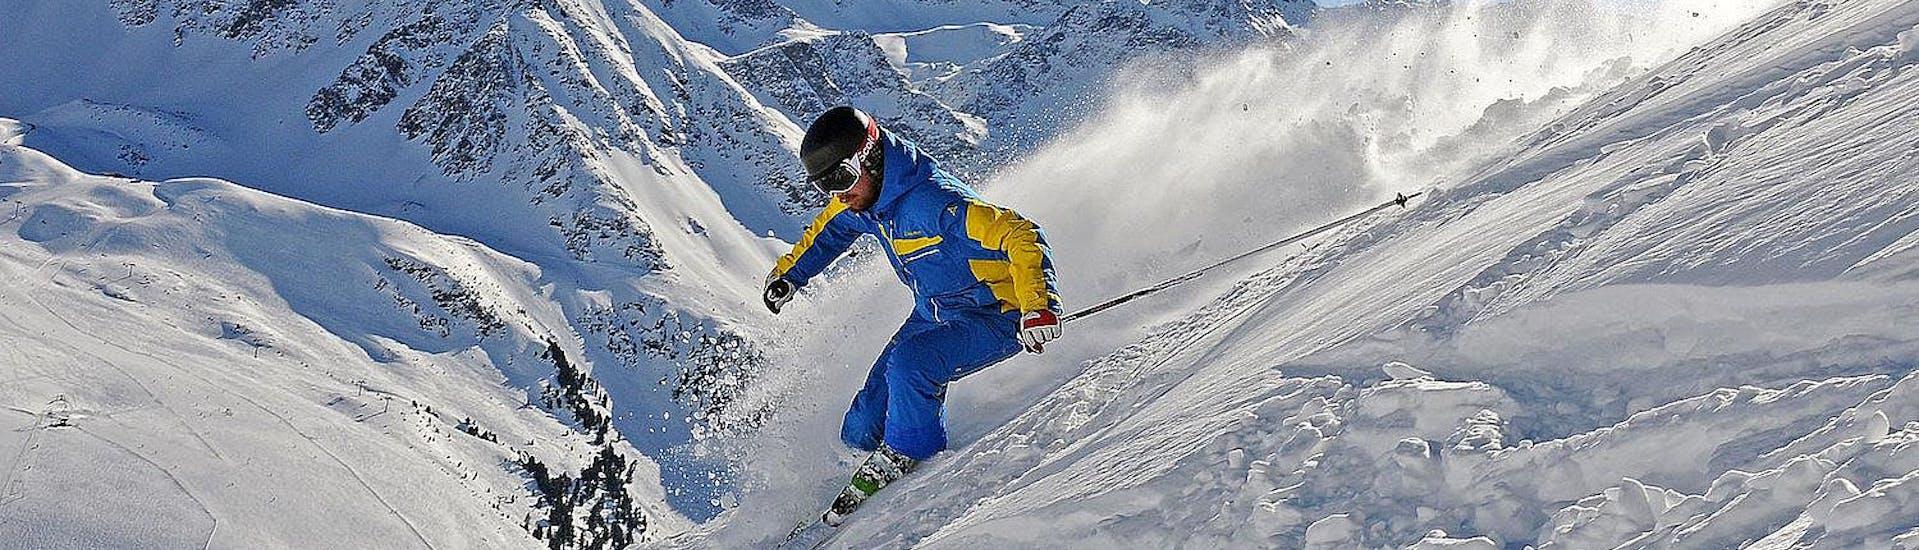 Private Ski Lessons for Adults of All Levels avec 1. Schi- und Snowboardschule Kühtai - Hero image